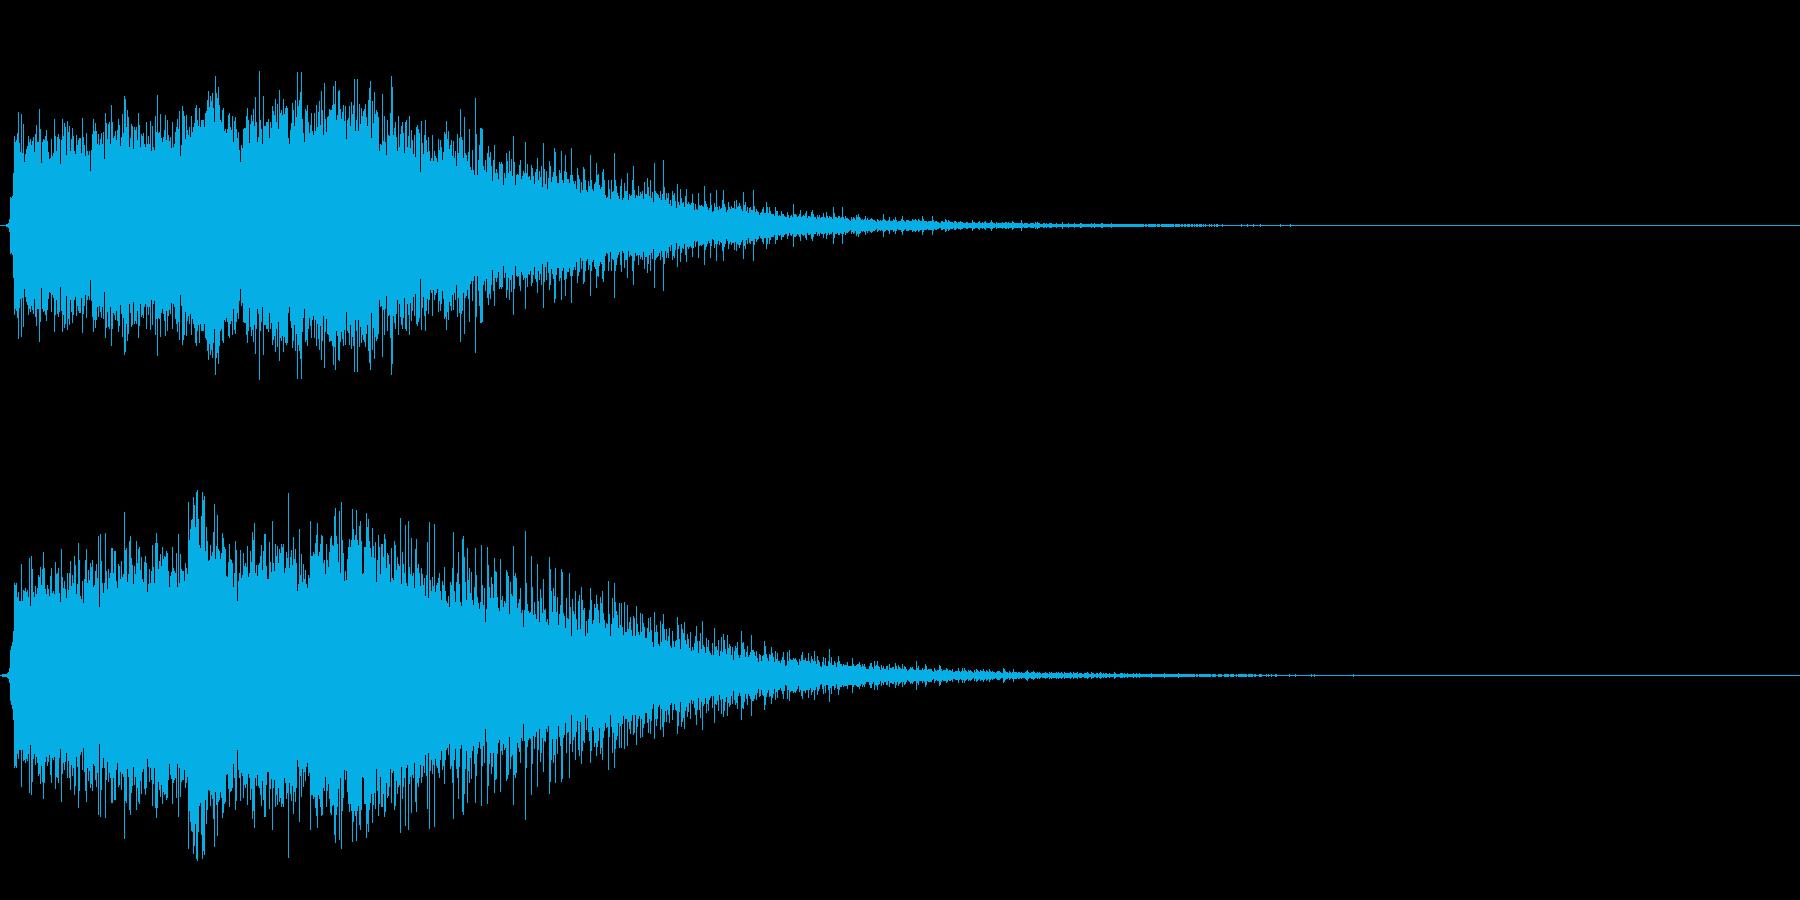 Dark_Attack-34_Delayの再生済みの波形